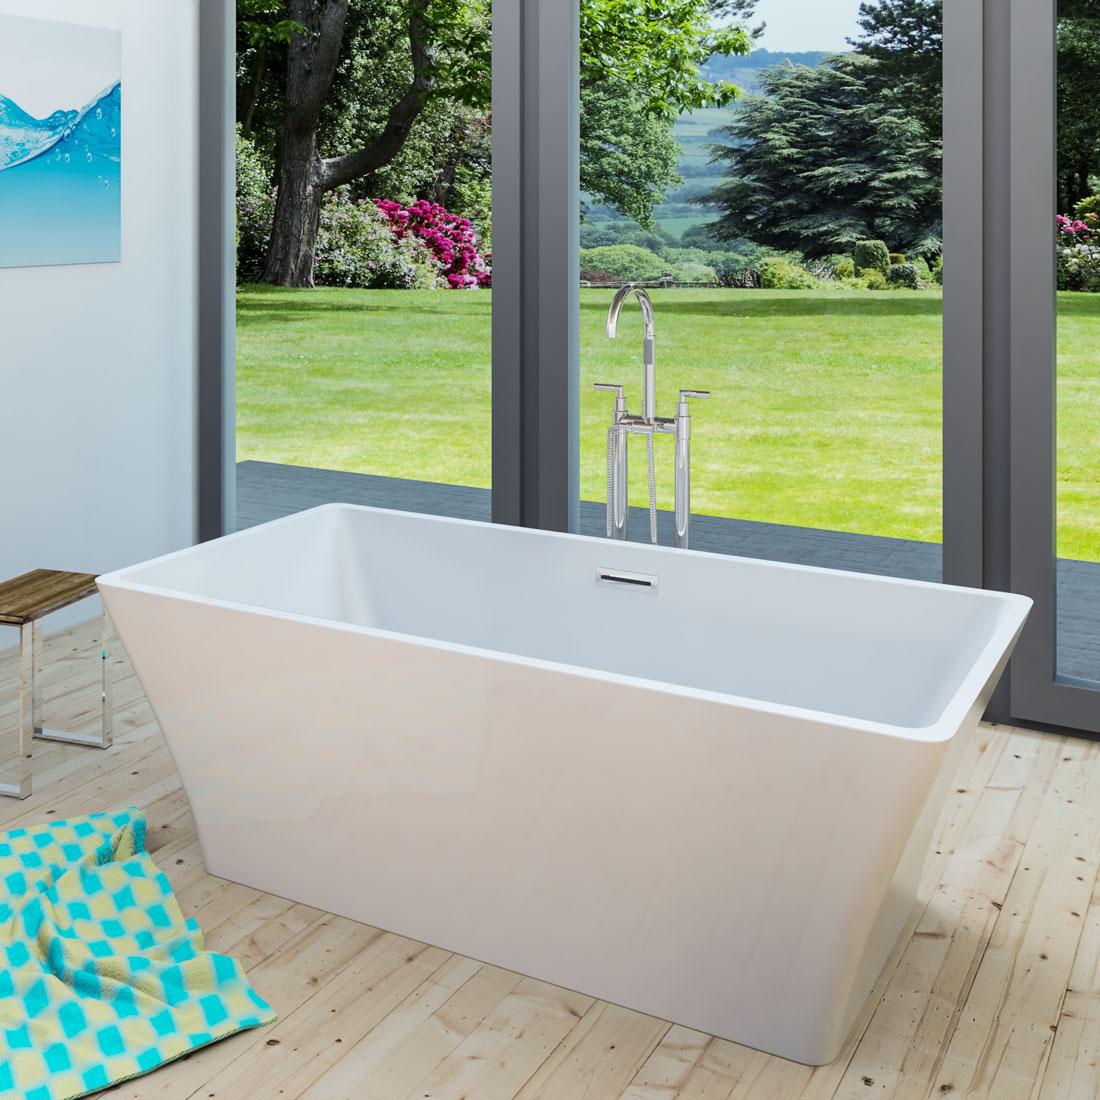 acquavapore freistehende badewanne wanne acryl fsw02 170x80cm armatur w hlbar. Black Bedroom Furniture Sets. Home Design Ideas